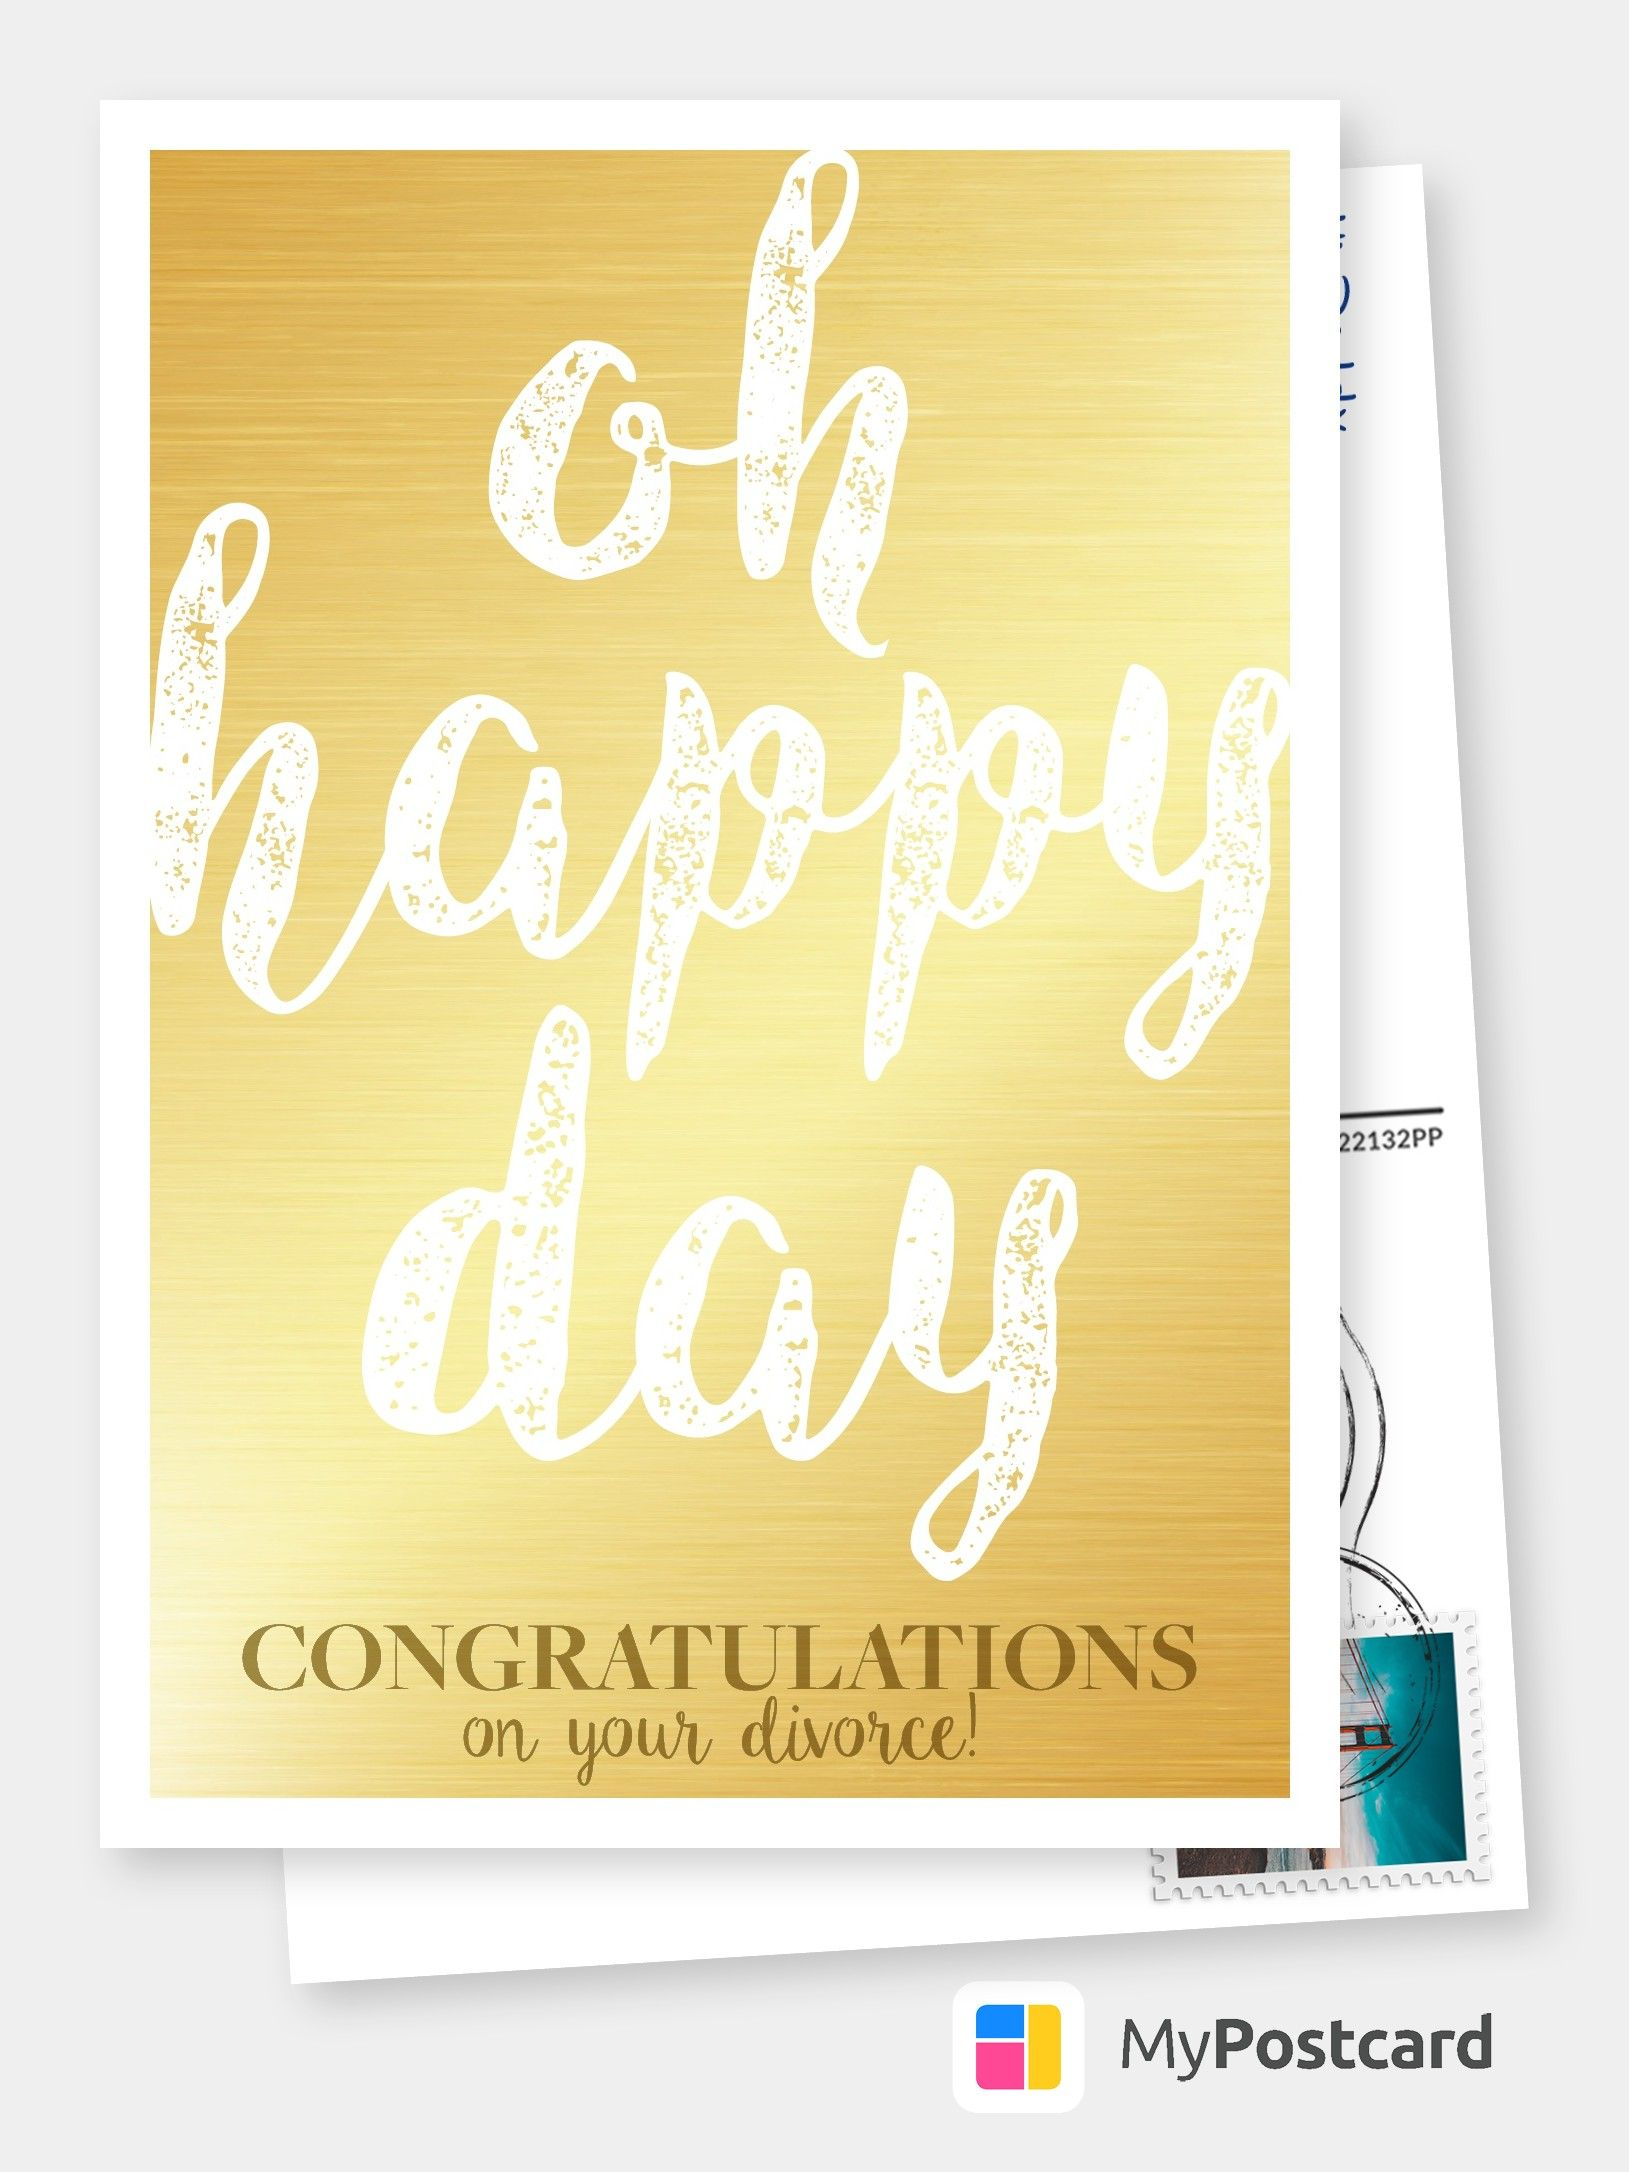 Divorce oh happy day! Congratulation Cards & Quotes